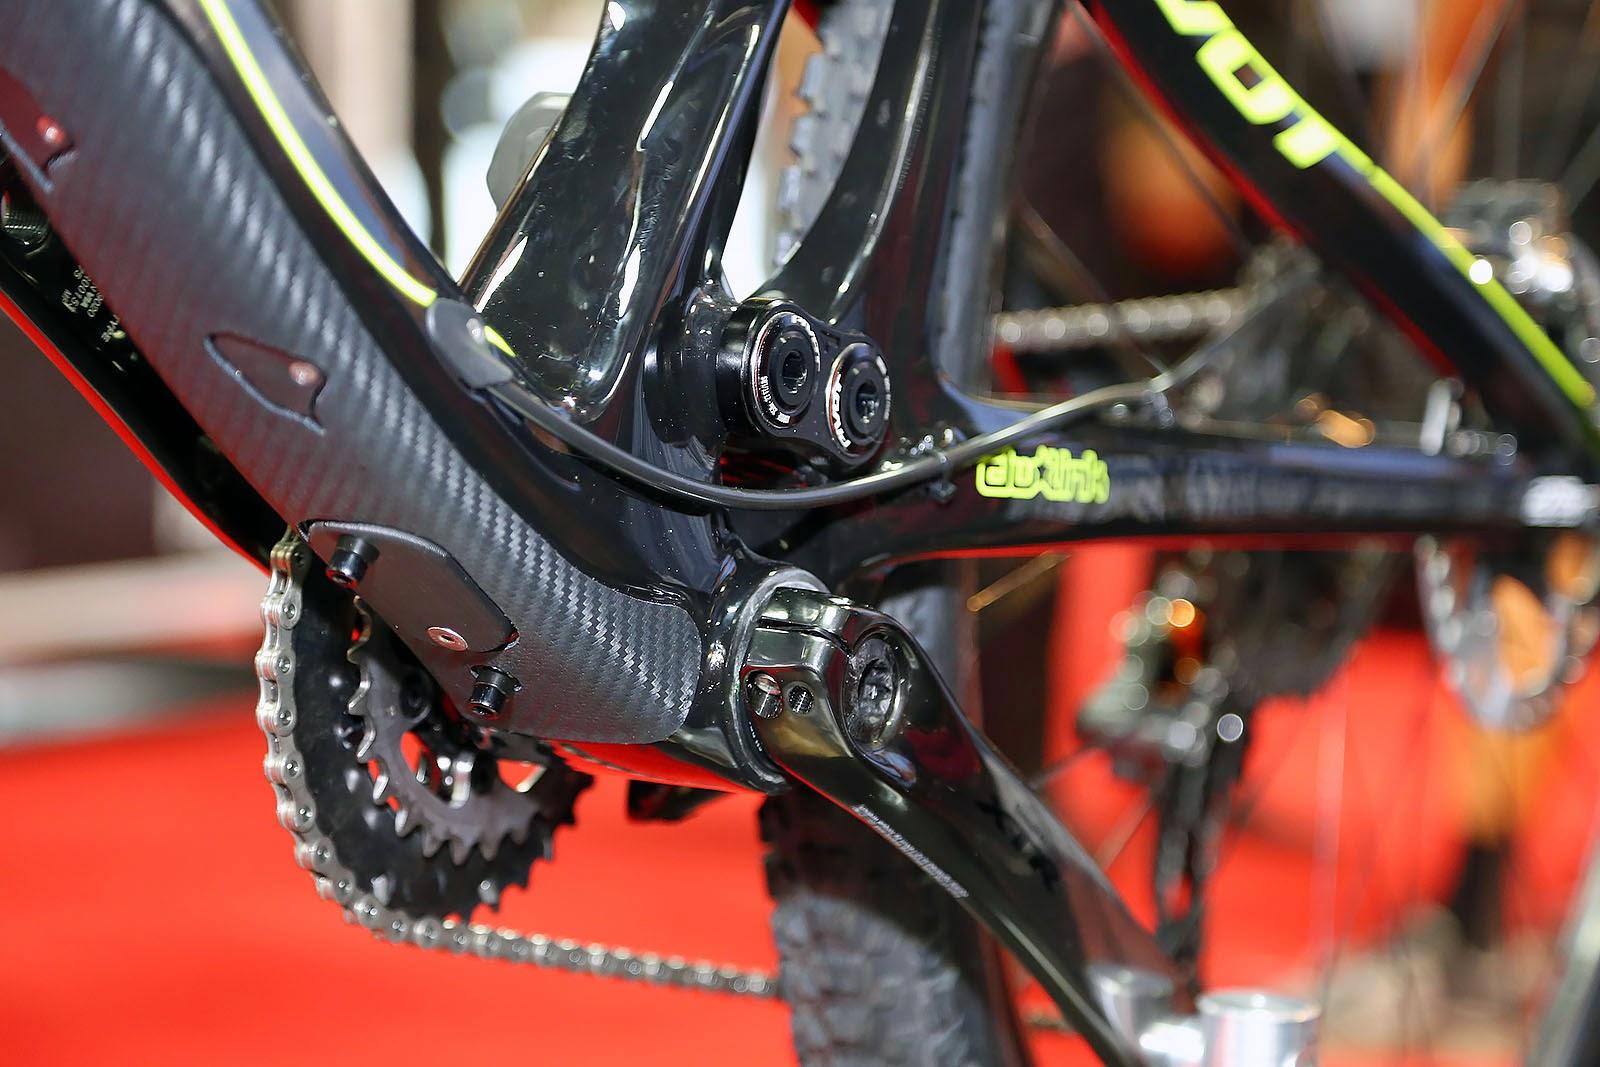 Bike News, Carbon Mountain Bike, New Bike, New Product, Report, Pivot Mach 2015, Pivot 27.5, Pivot Mach Carbon